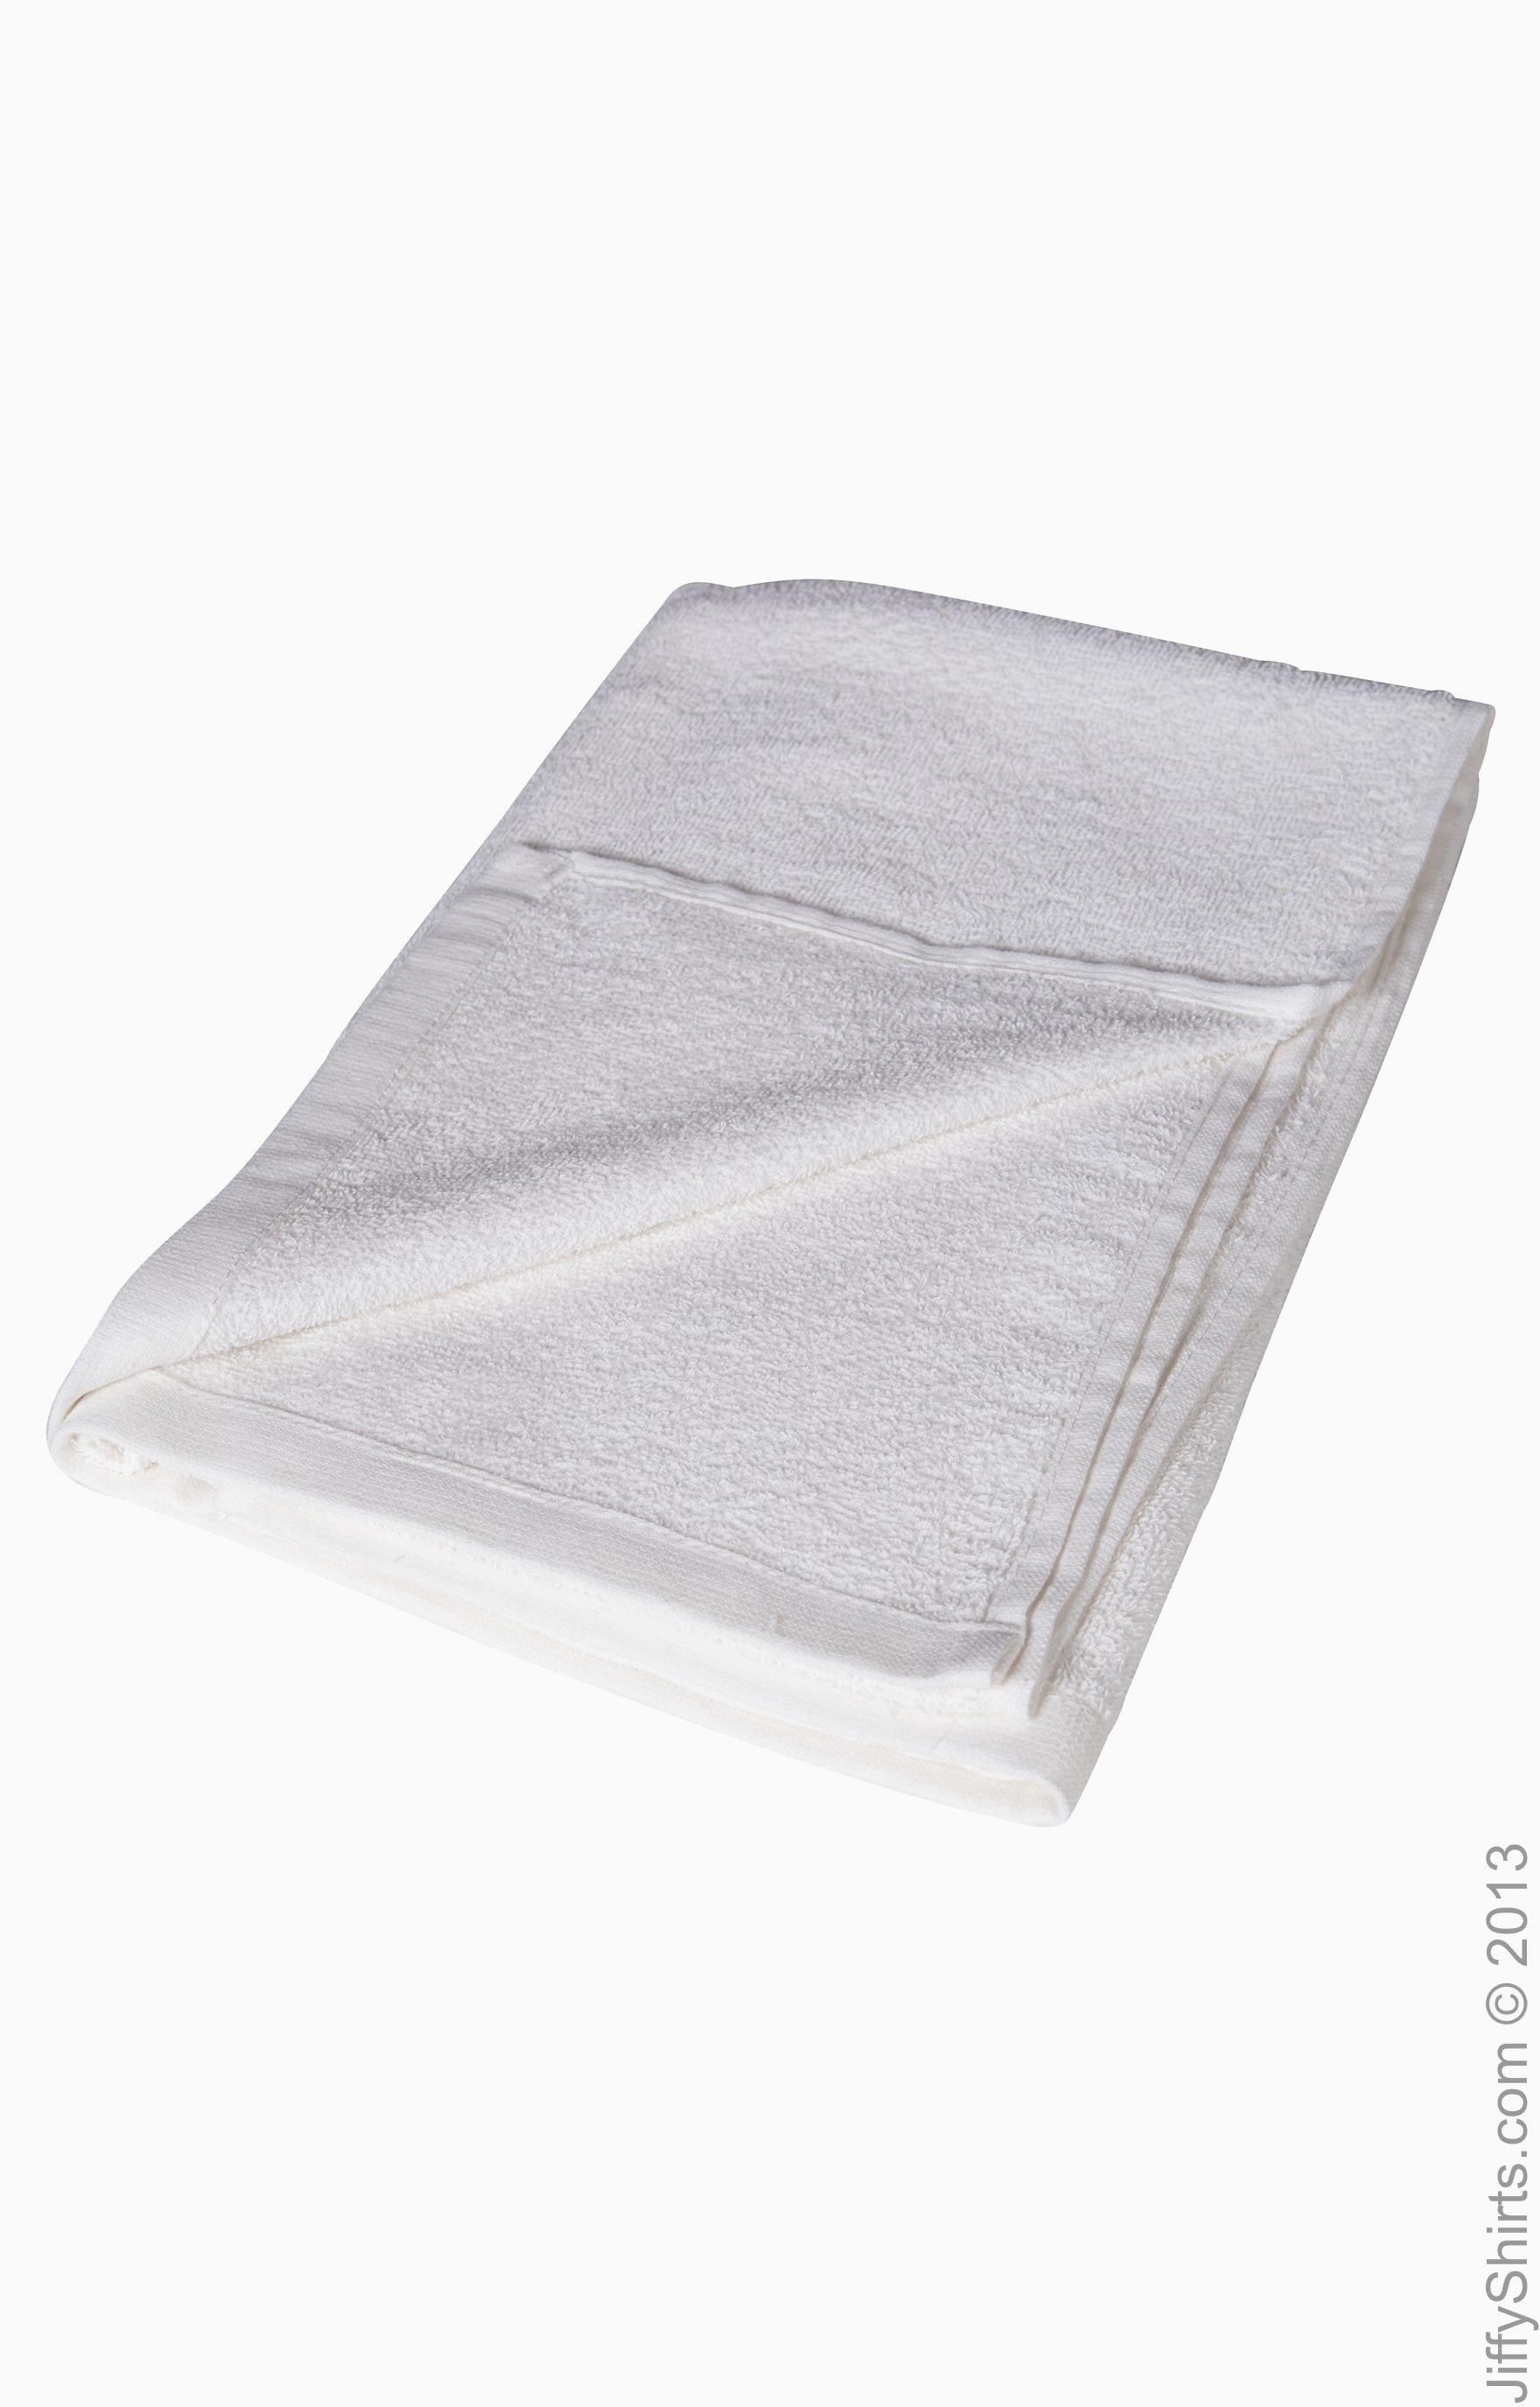 Carmel Towel Company C2858 White